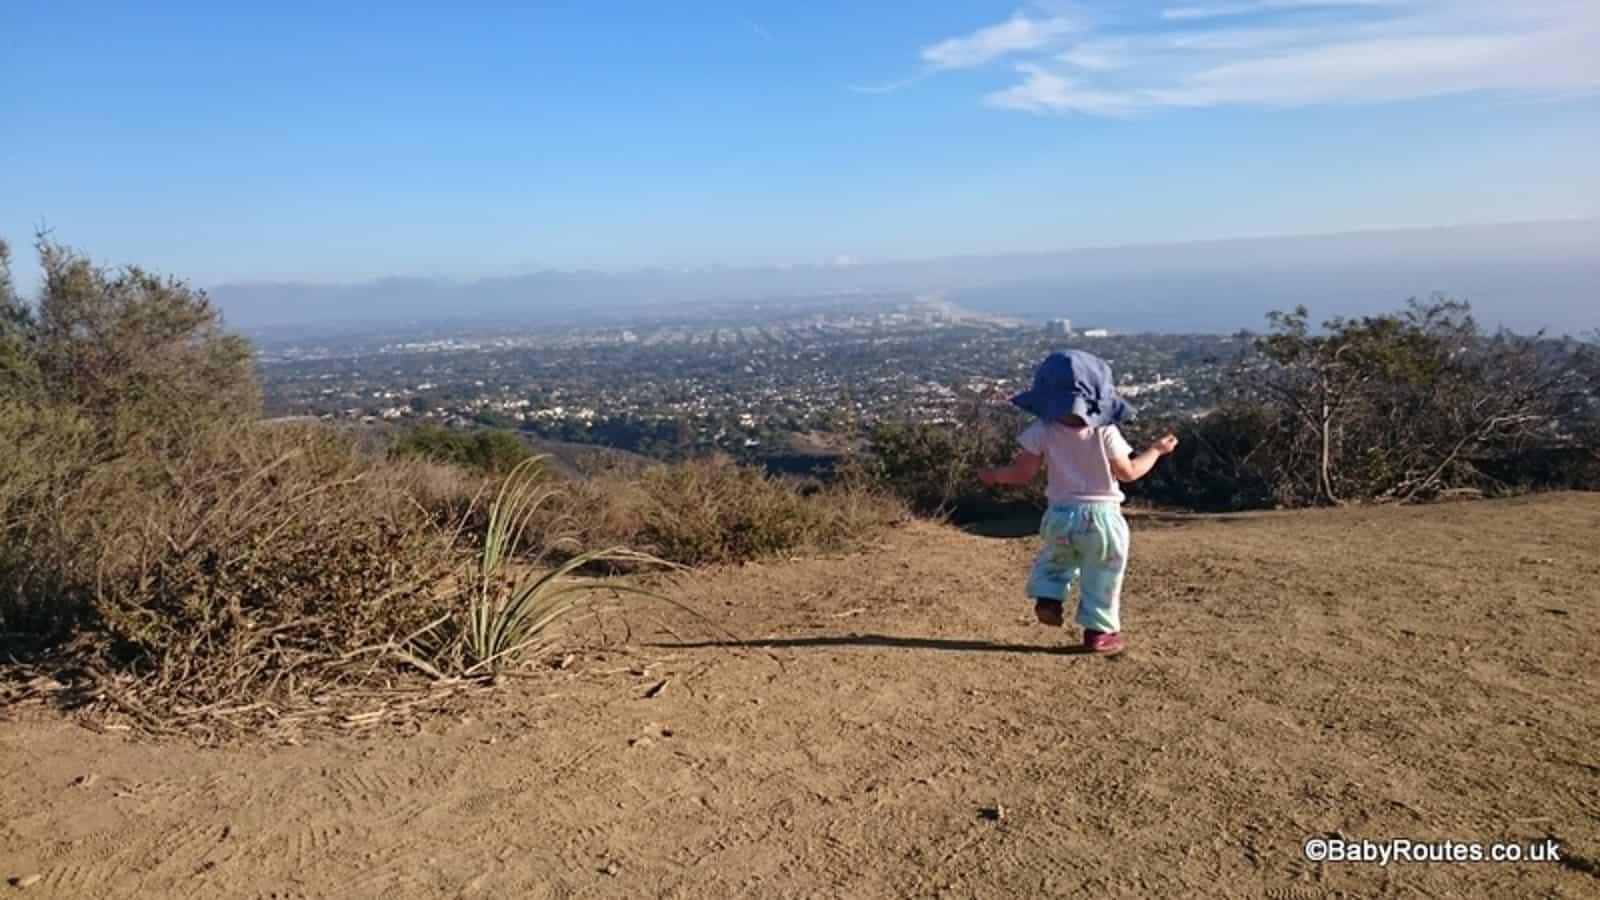 Holiday Snapshots #41 Santa Monica, California